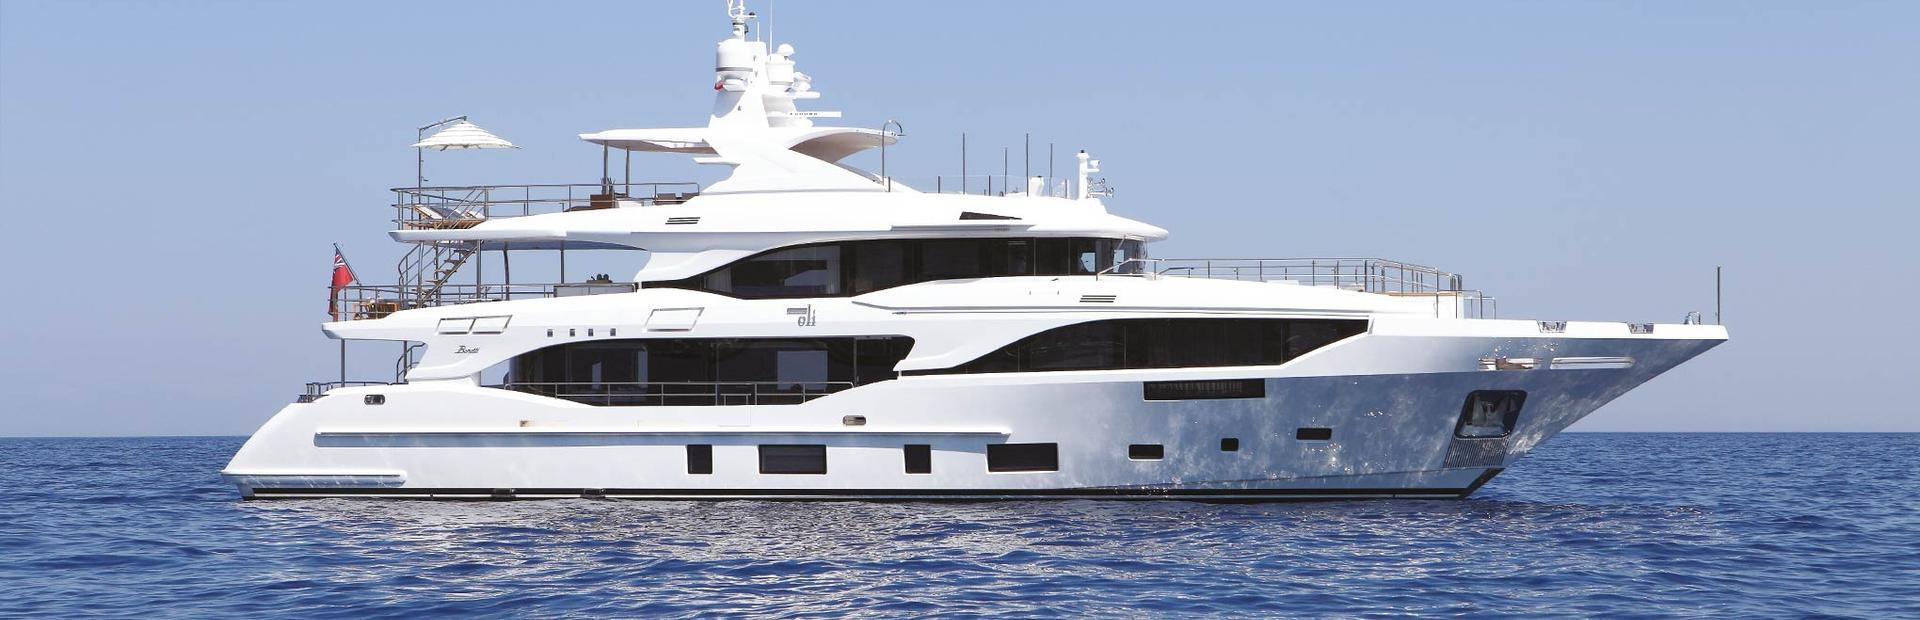 Mediterraneo 116 Yacht Charter